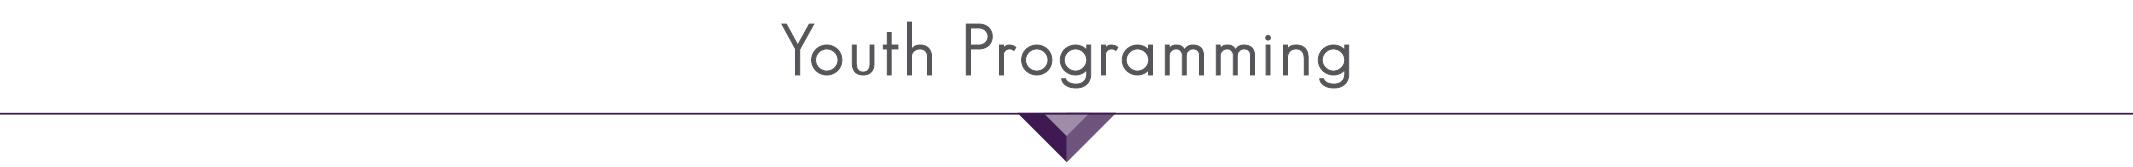 Youth Programming_header